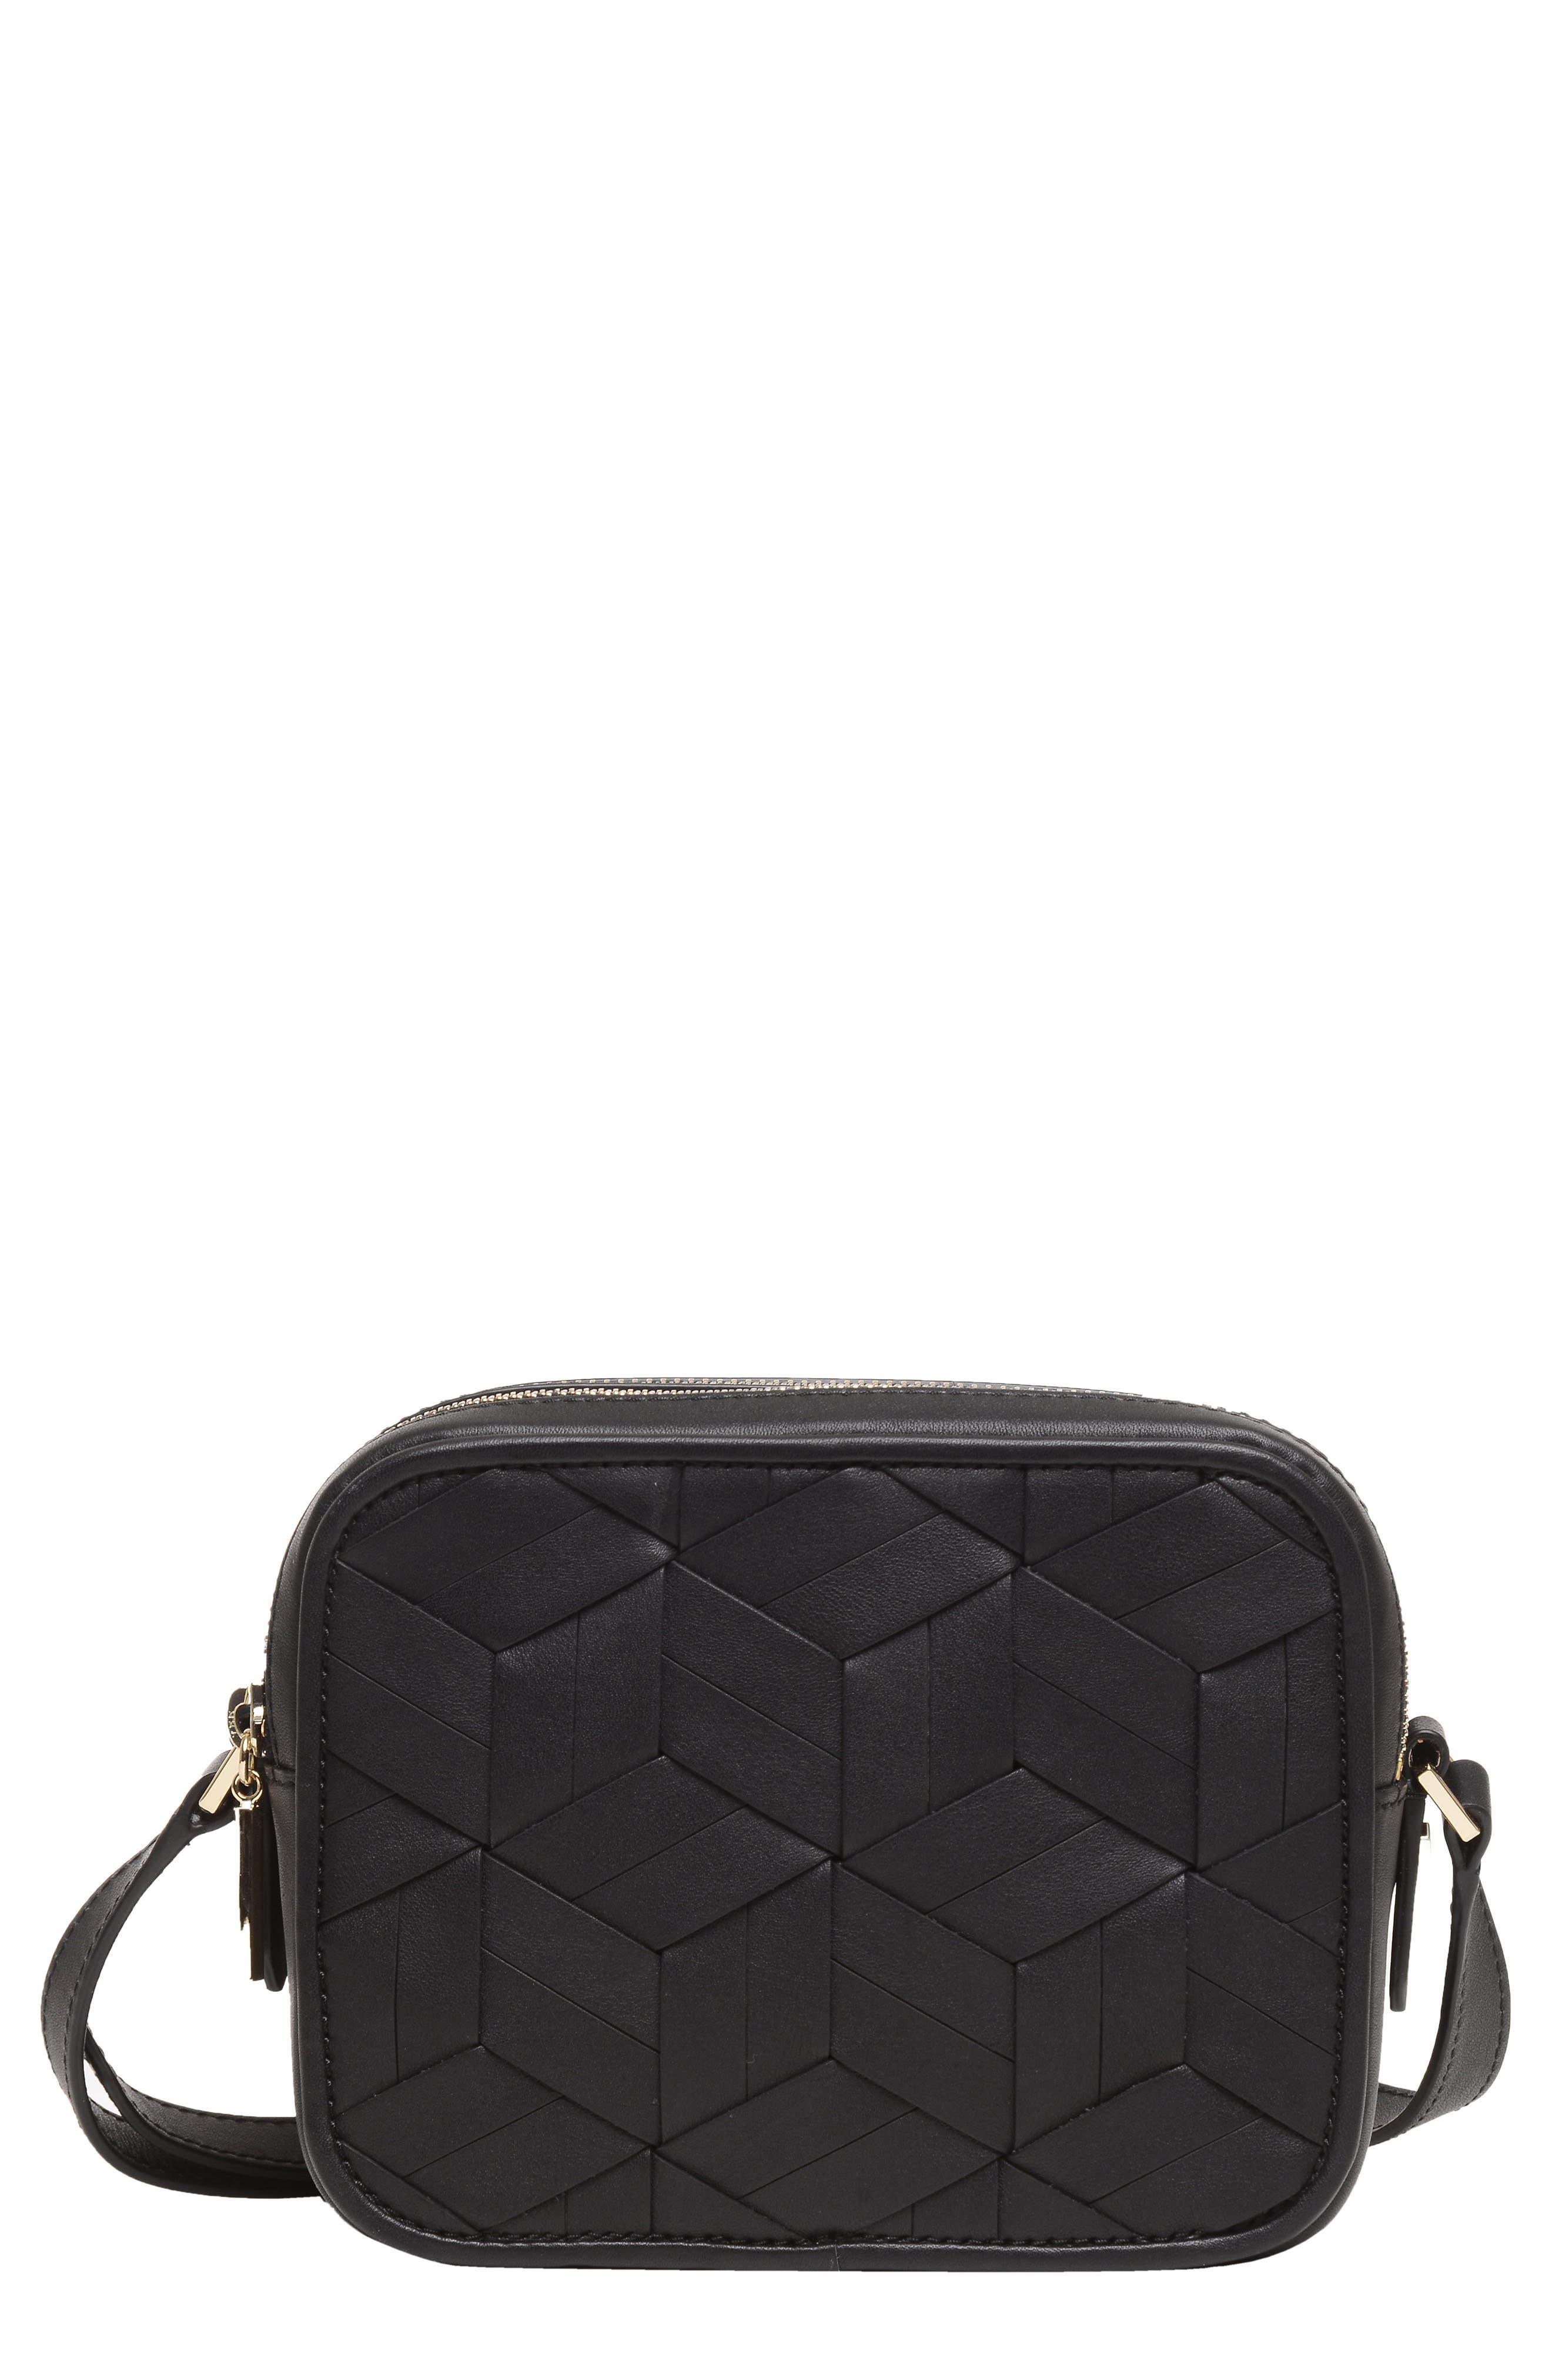 Explorer Woven Leather Camera Bag,                             Main thumbnail 1, color,                             Black